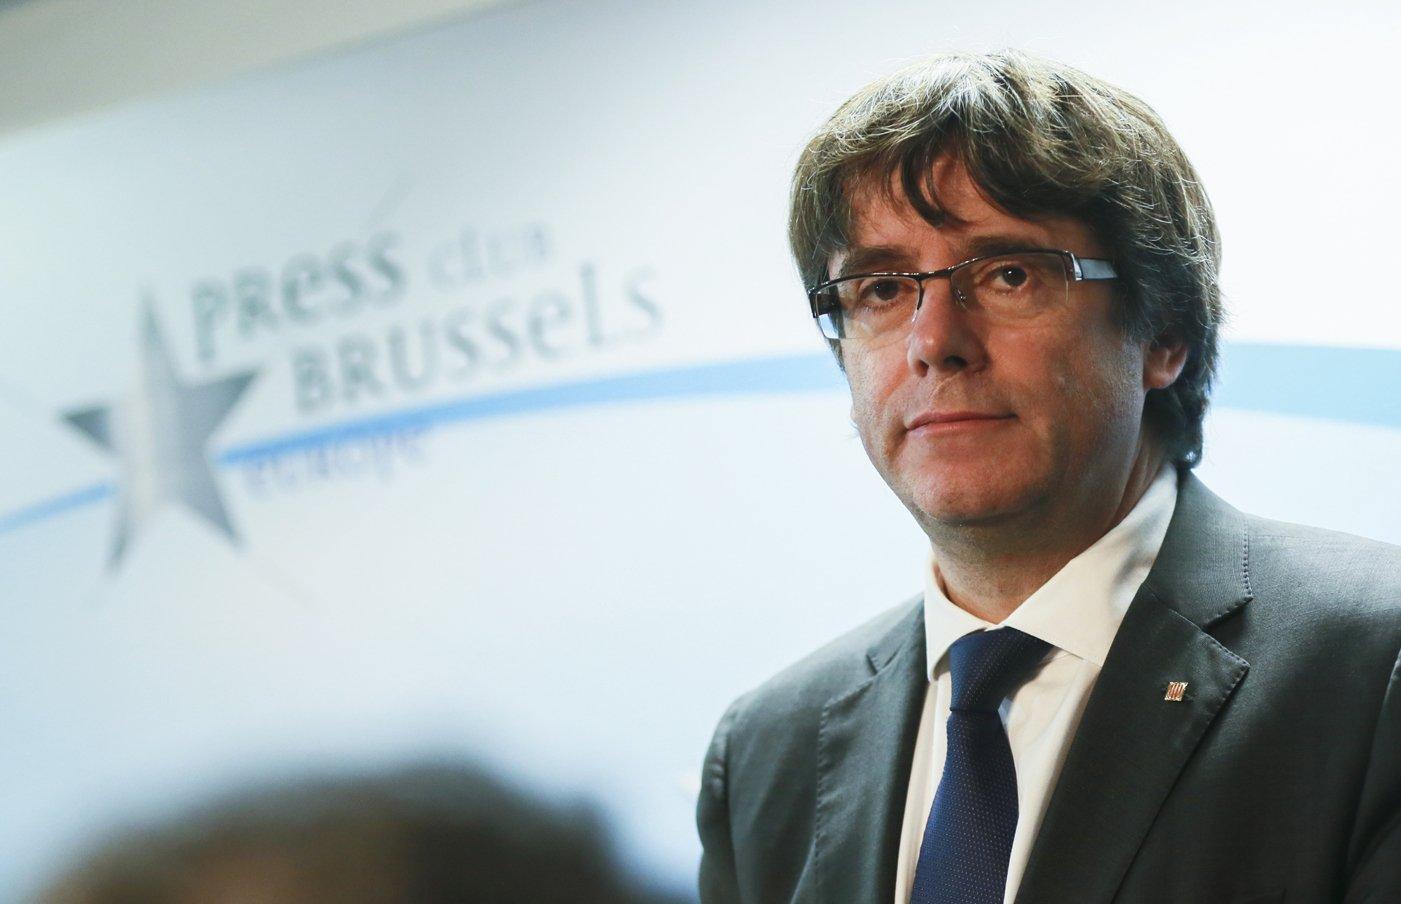 СМИ: Пучдемон отказался от пенсии в 112 тысяч евро в год